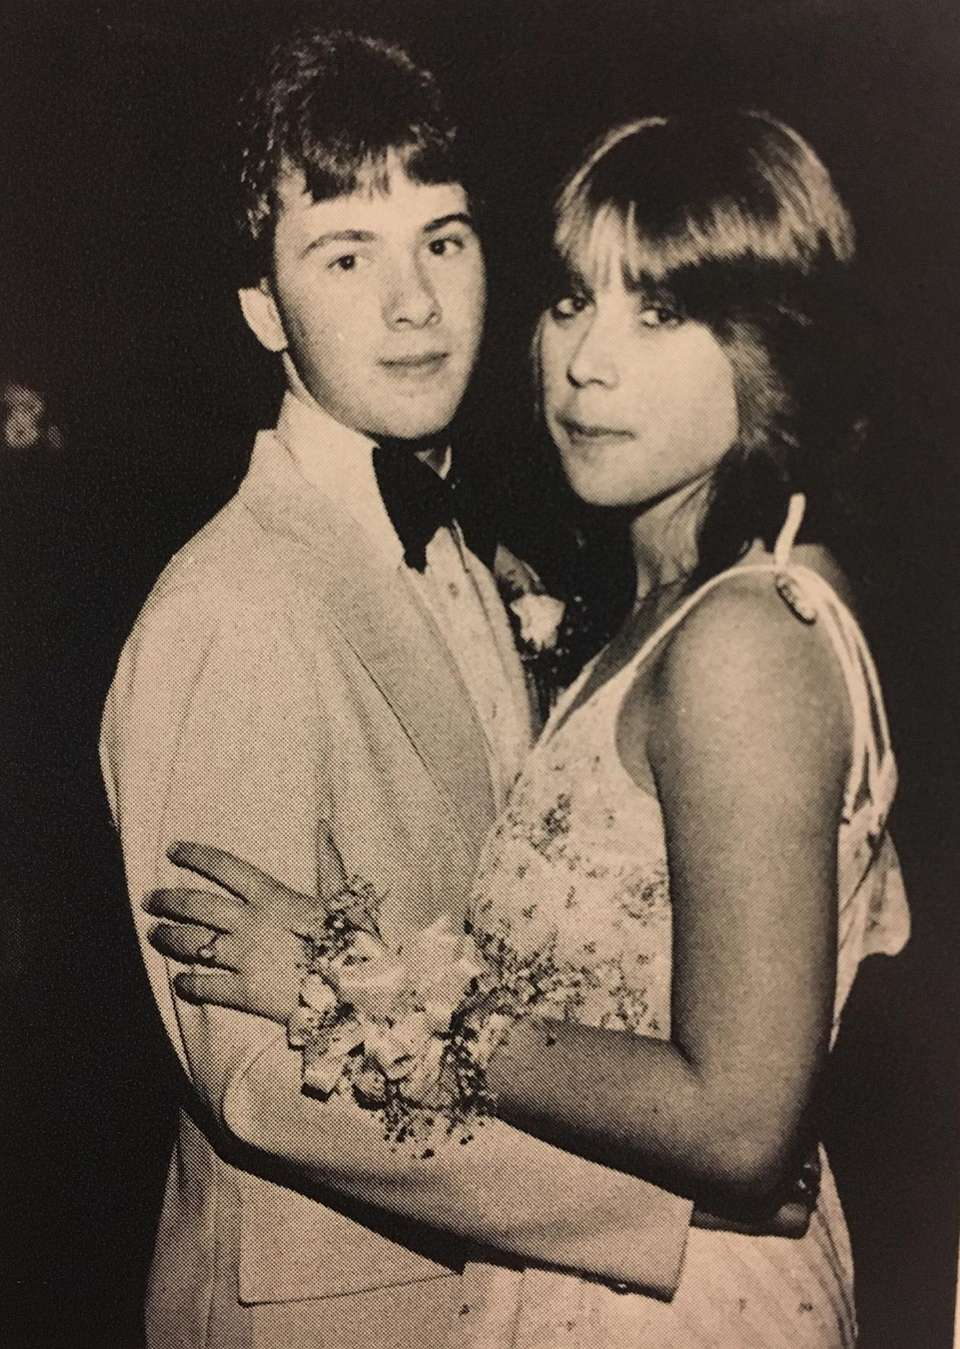 John McCaffrey and Diane Cadullo were crowned as